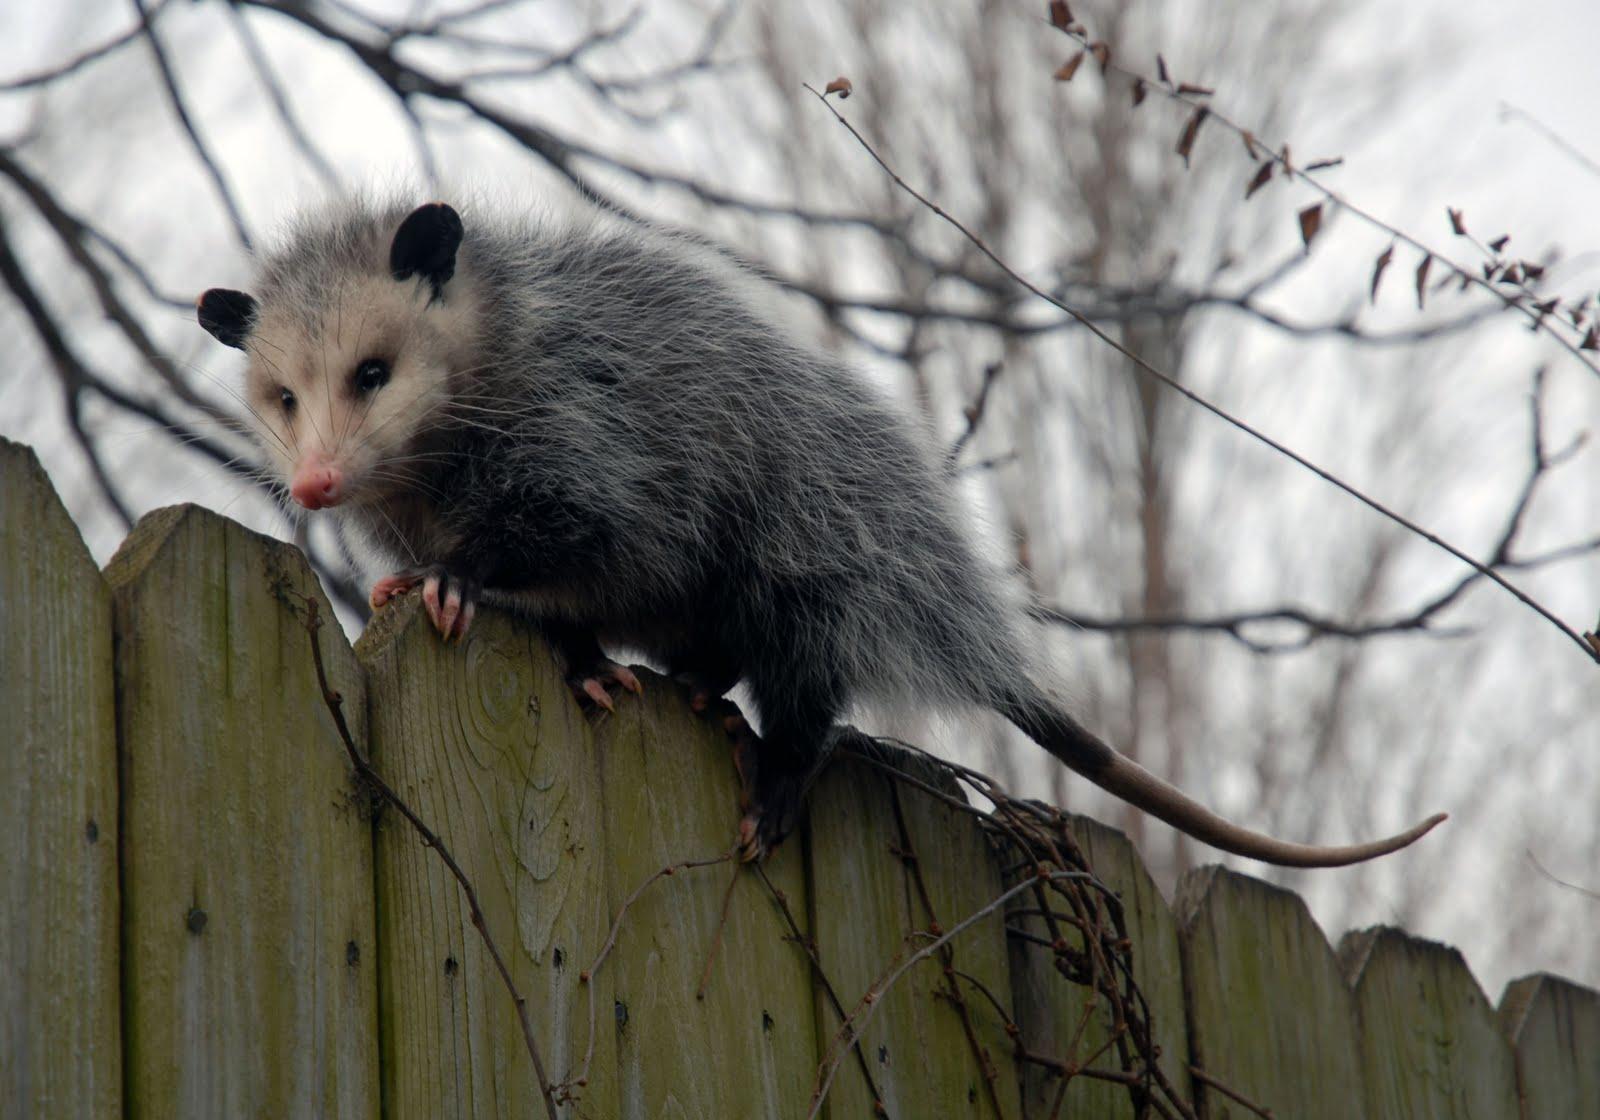 piety-possum-is-walking-away-from-all-your-bullshit